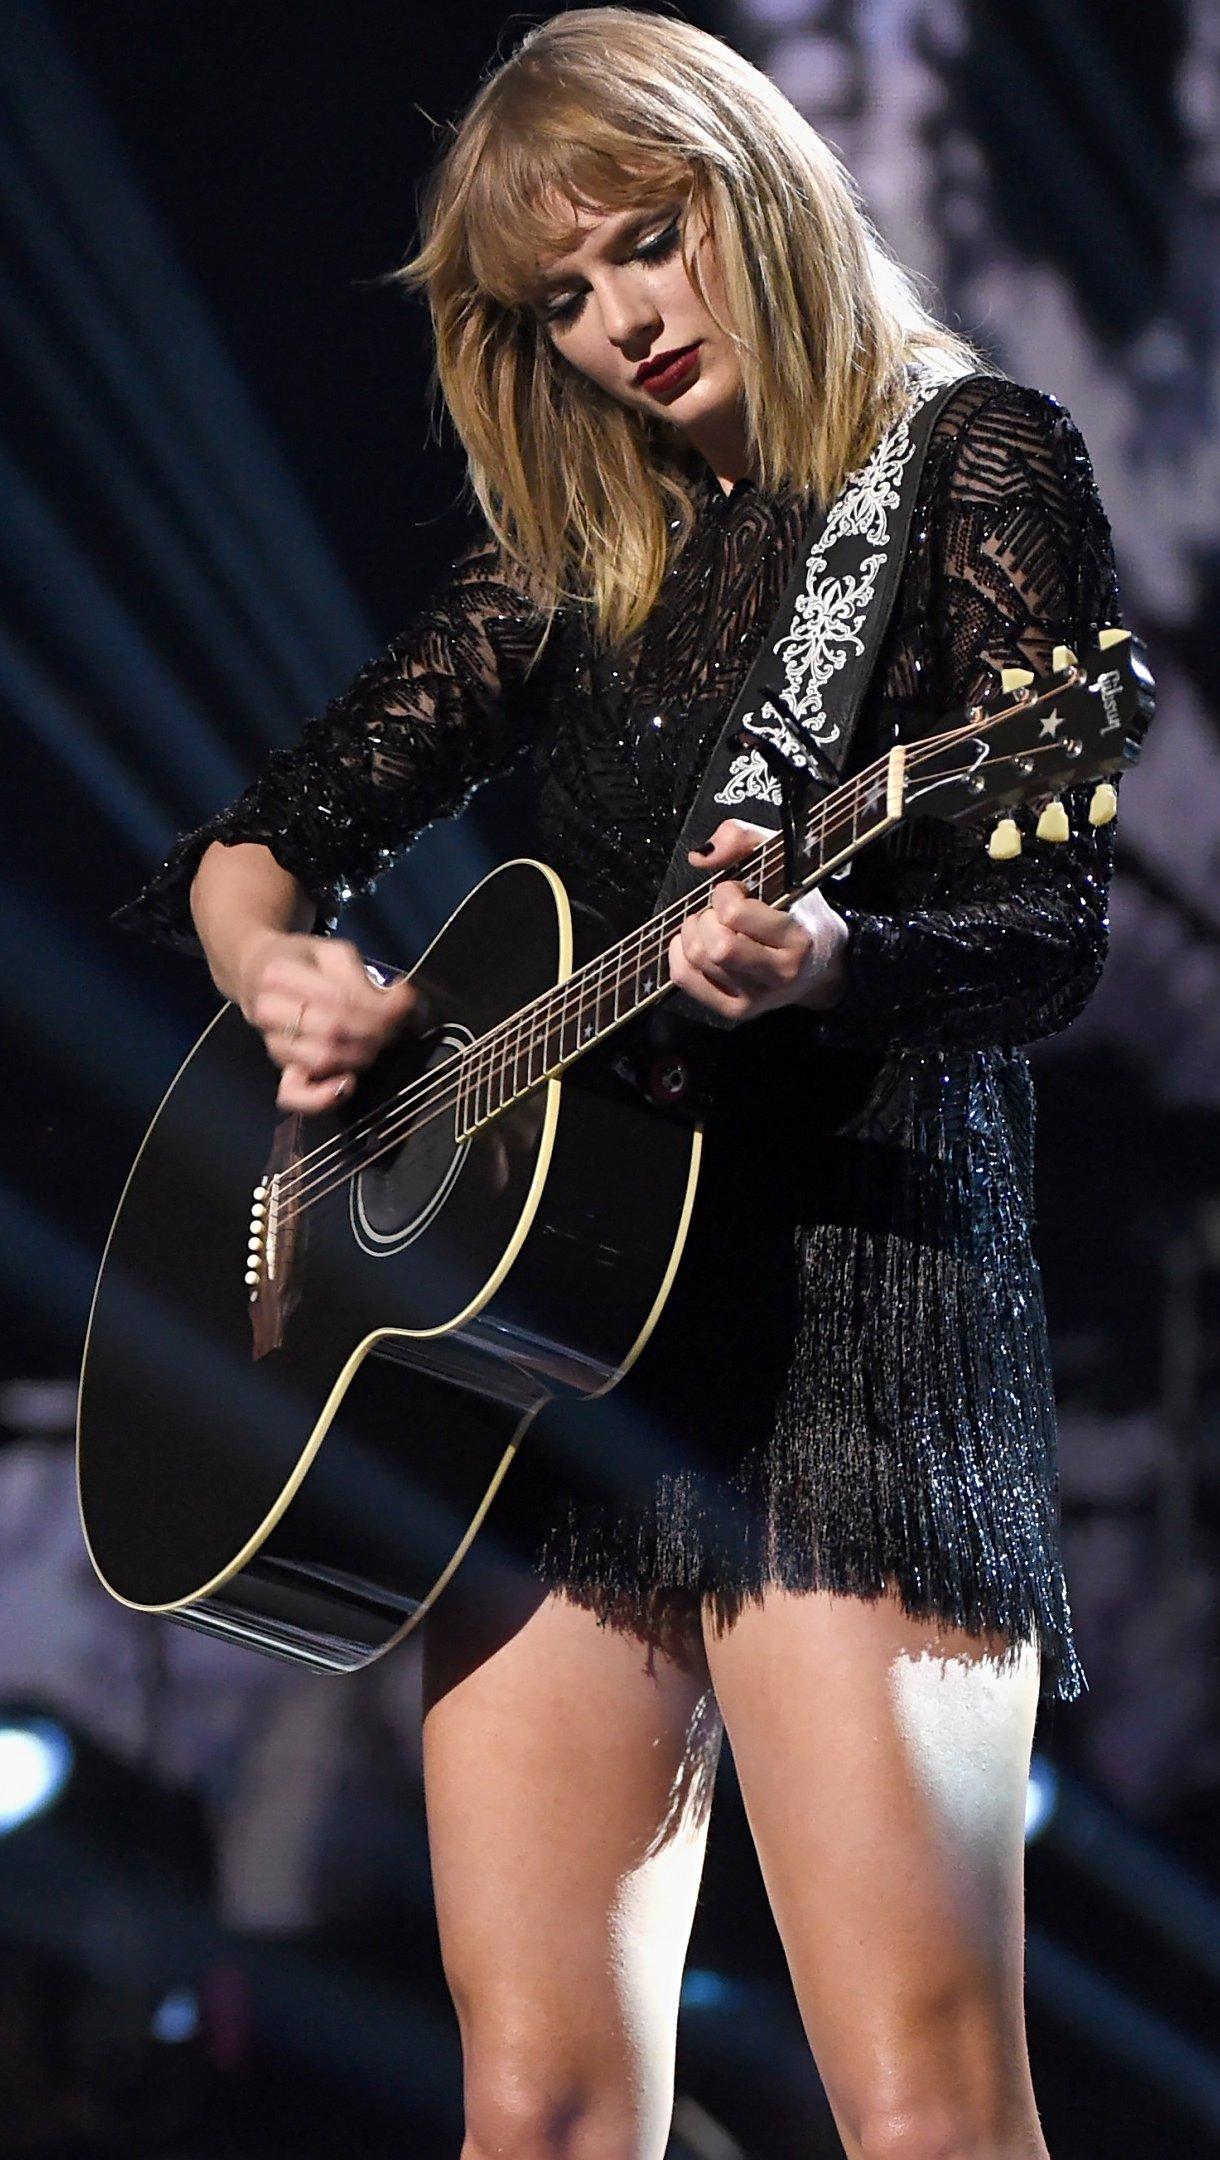 Fondos de pantalla Taylor Swift en MTV music awards 2017 Vertical